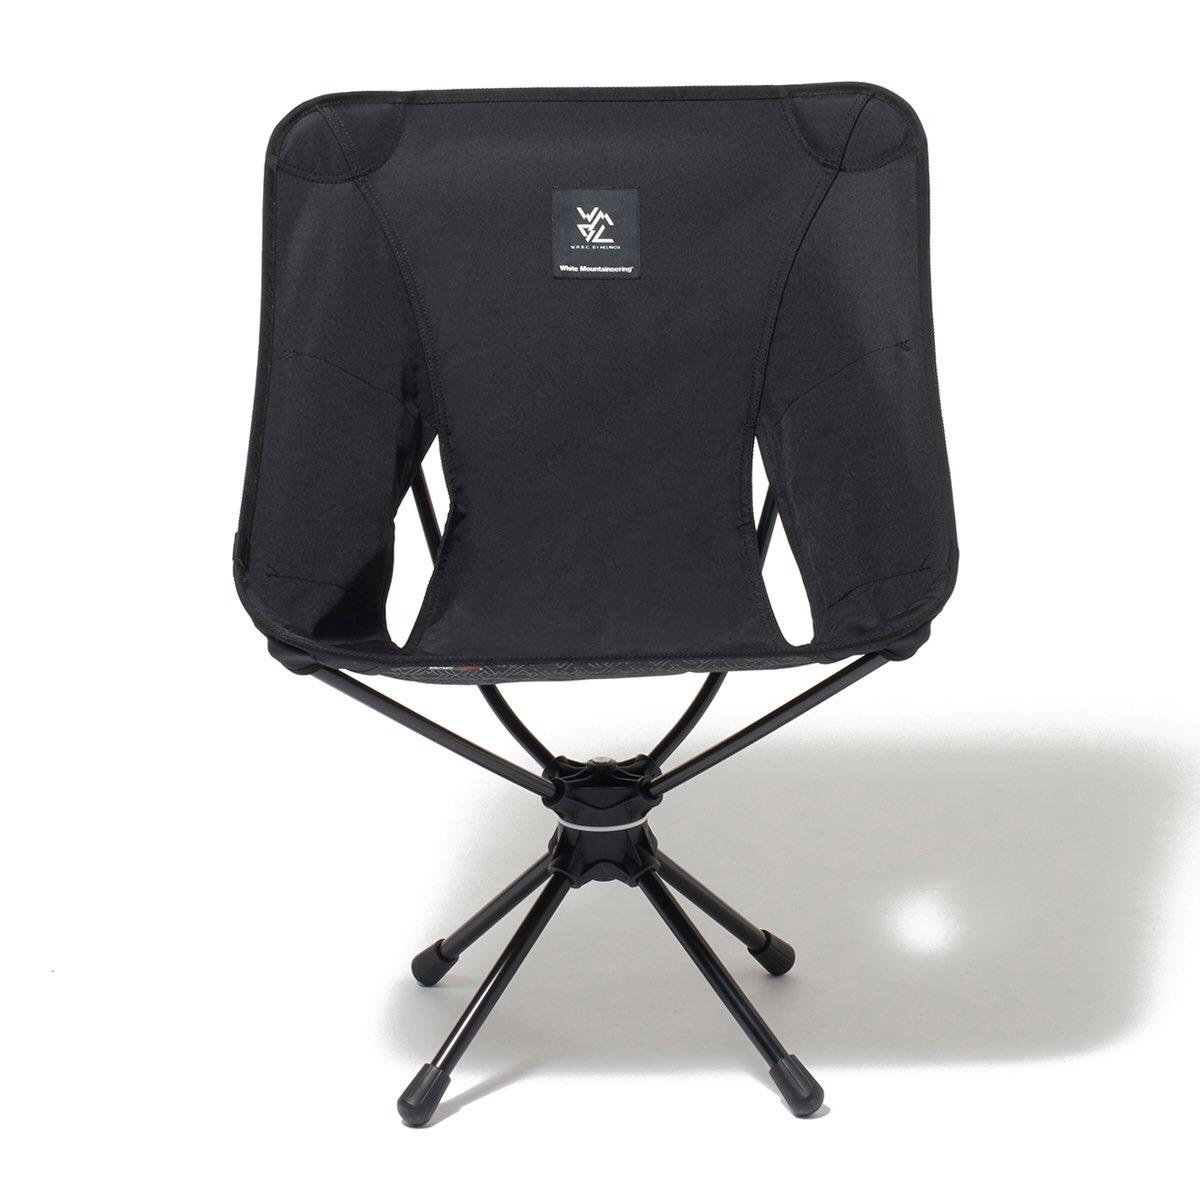 Sensational W M B C By Helinox 19Ss Collection Wmhelinox Tactical Machost Co Dining Chair Design Ideas Machostcouk